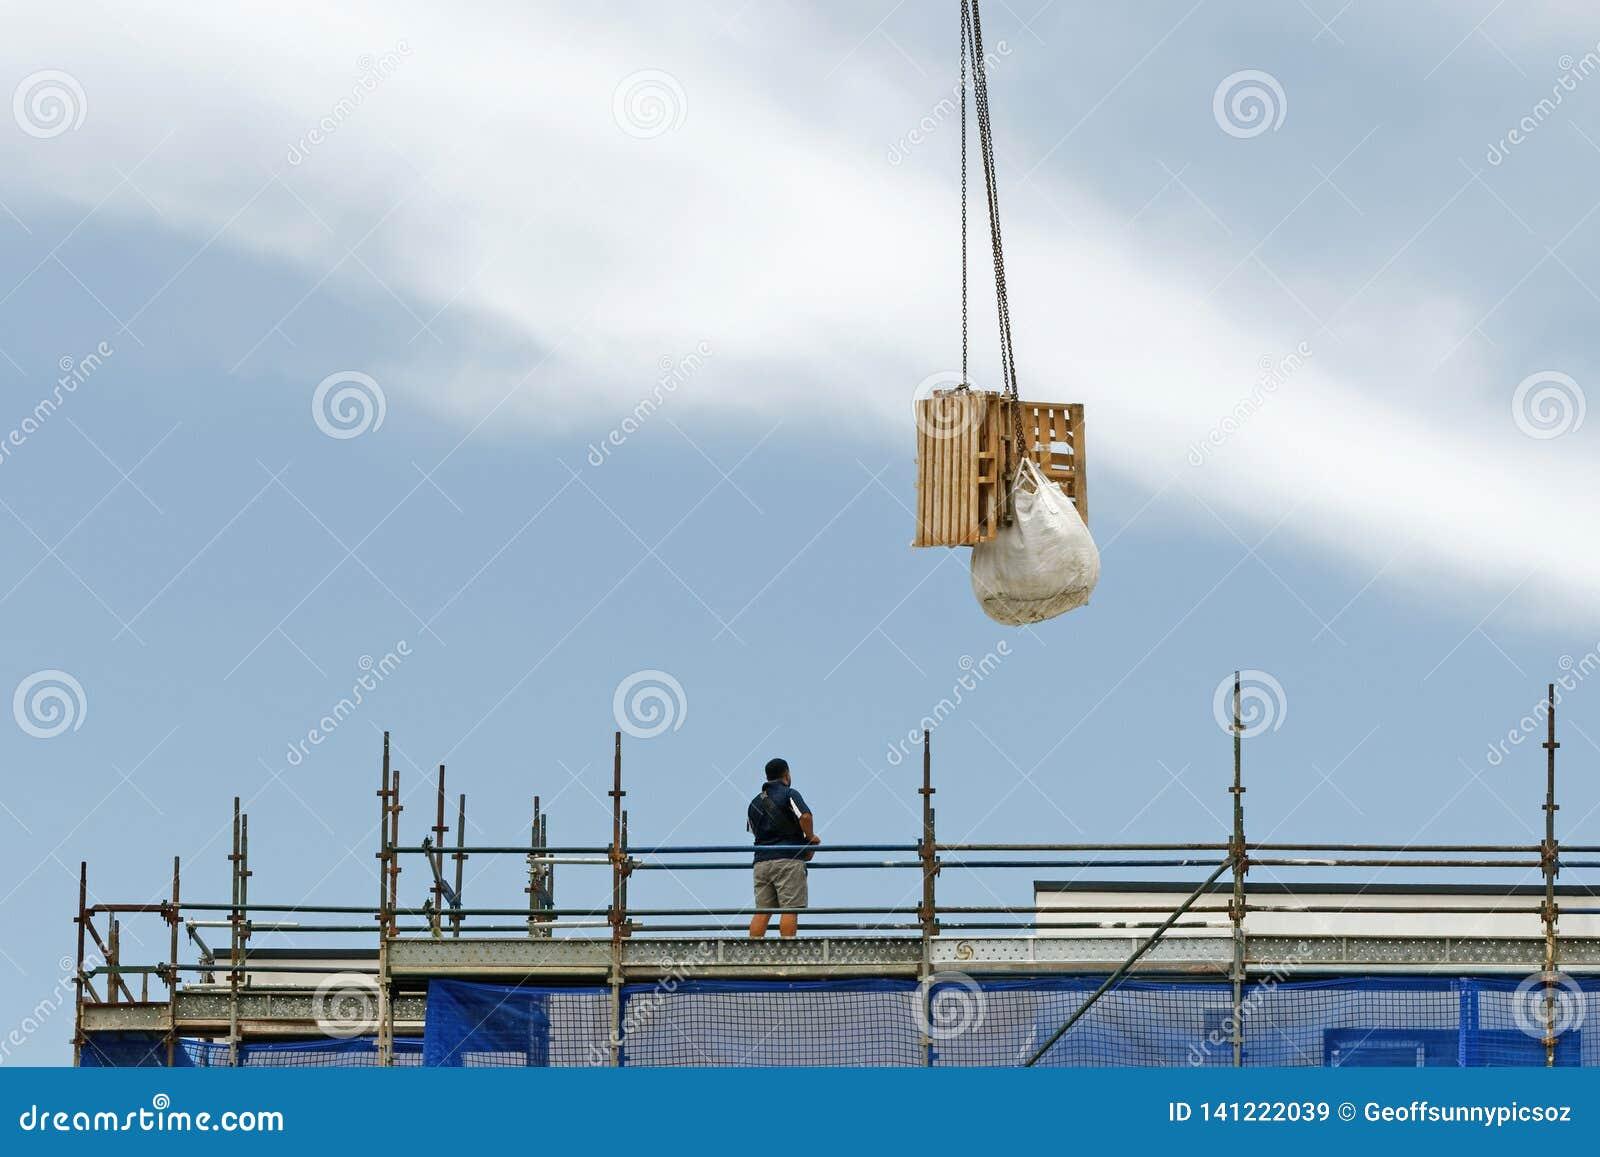 Working construction crane operation. Update 179 . Gosford. January 2019